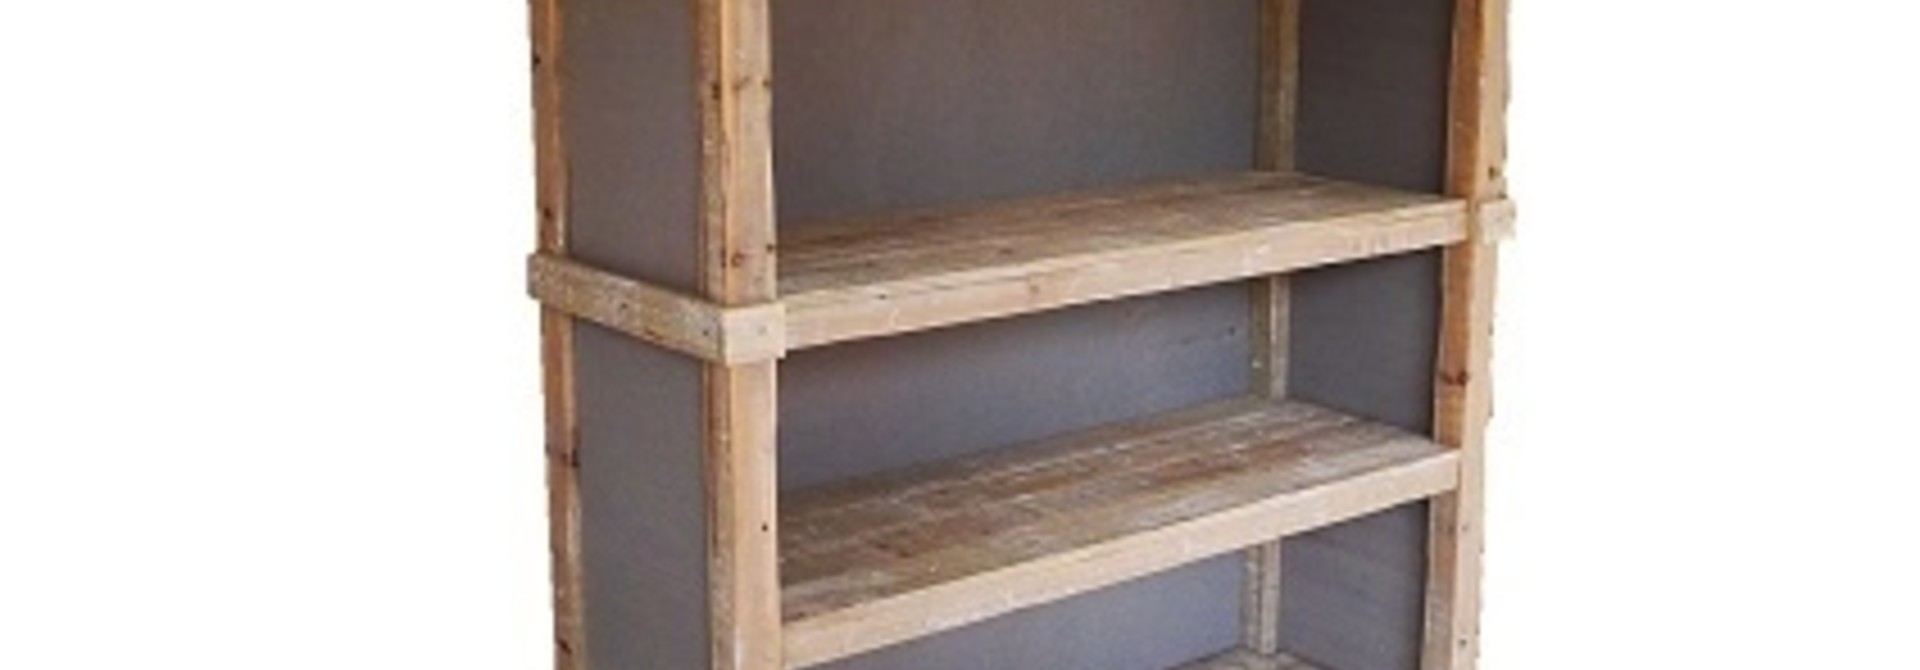 shop int old dutch cabinet C 220